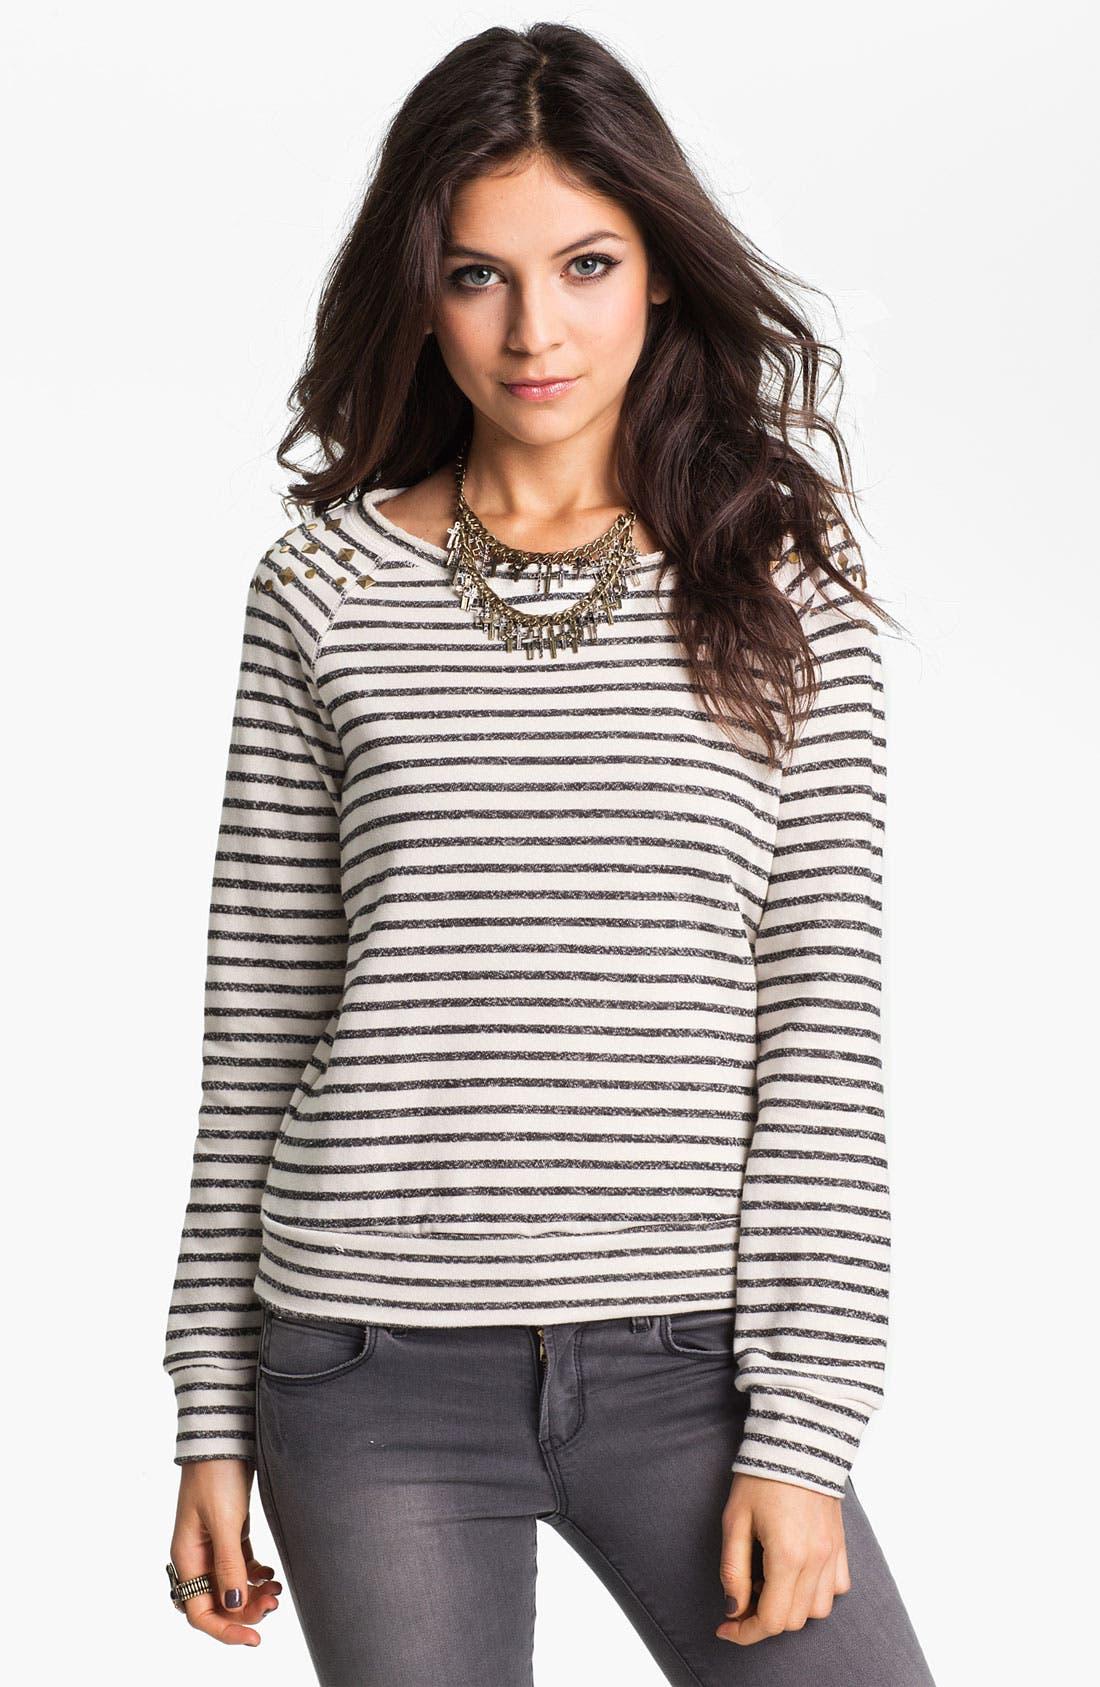 Alternate Image 1 Selected - Ten Sixty Sherman Stud Nautical Stripe Sweatshirt (Juniors)